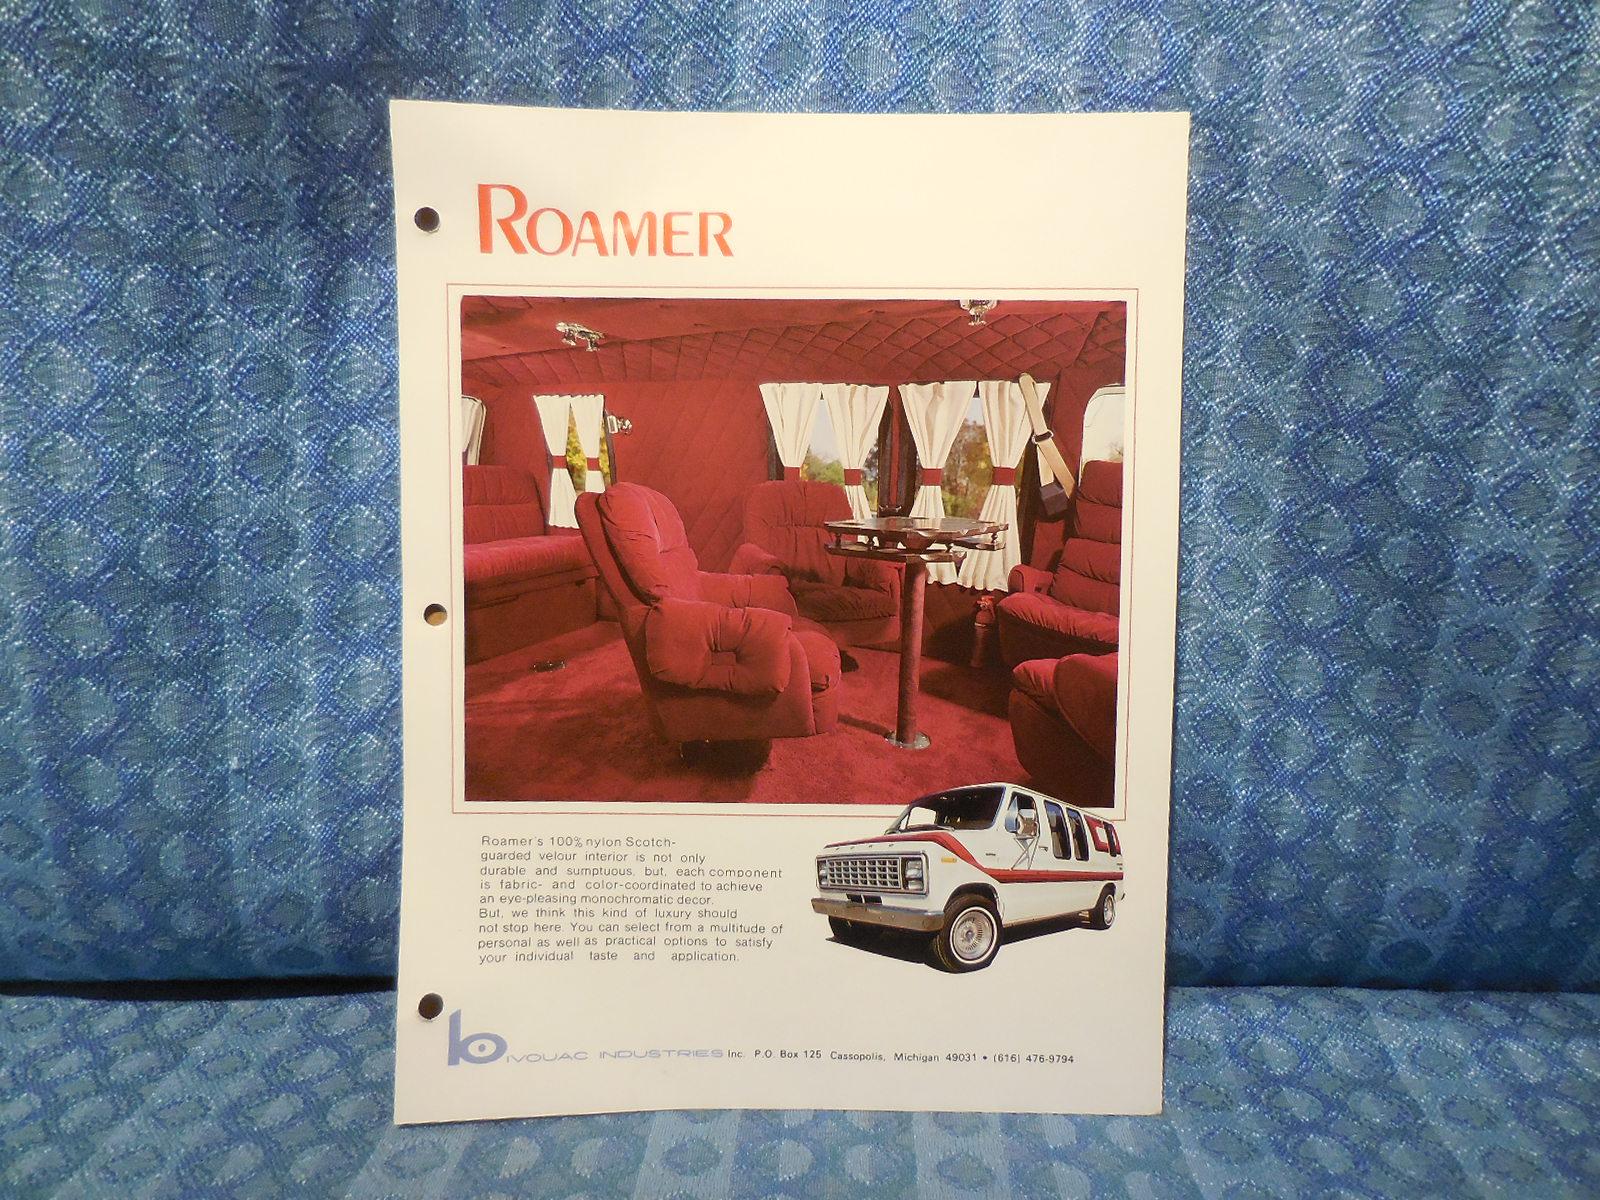 1979 Ford Conversion Van Original Sales Flyer Roamer by Bivouac Industries  - NOS Texas Parts, LLC - Antique Auto Parts